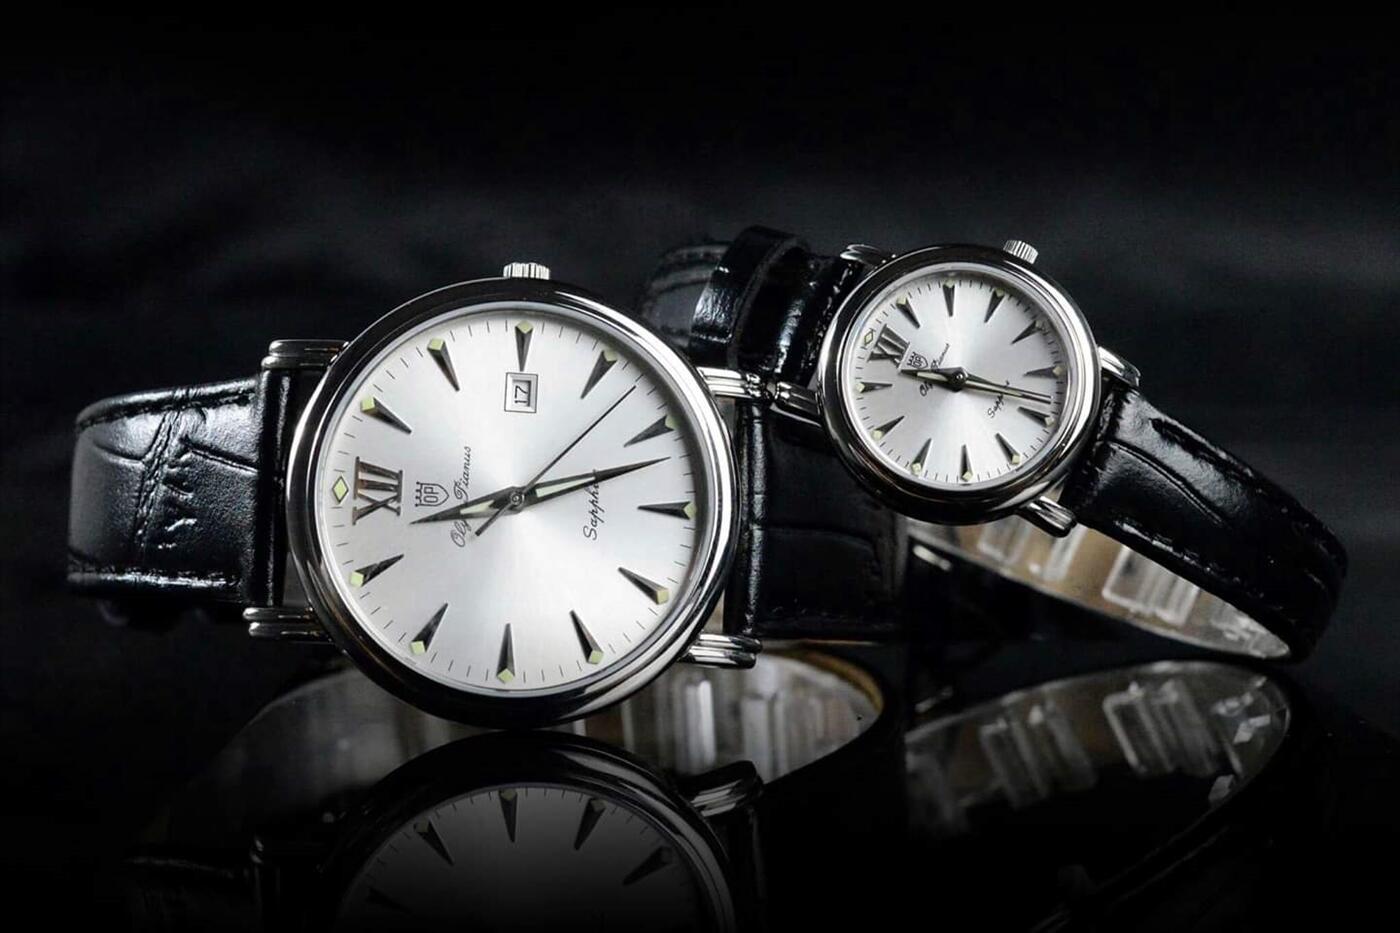 Đồng hồ đôi Olym Pianus DOI OP130-07S-GL-T